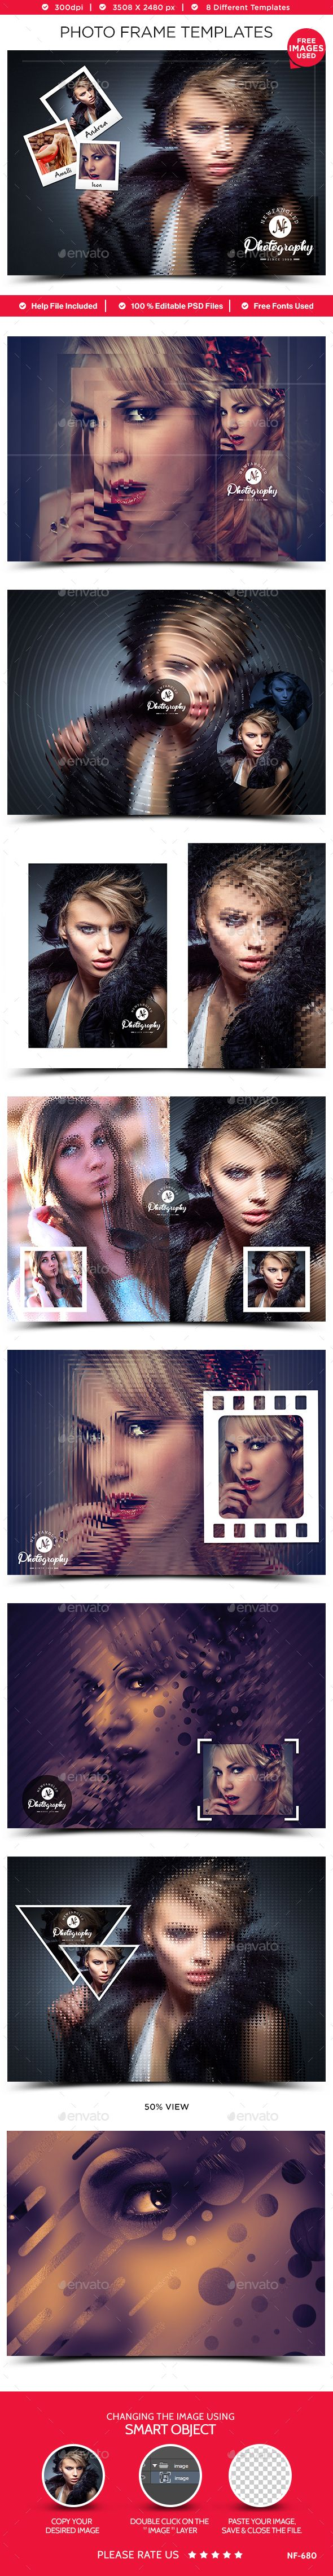 Photo Frame Templates - 8 Designs